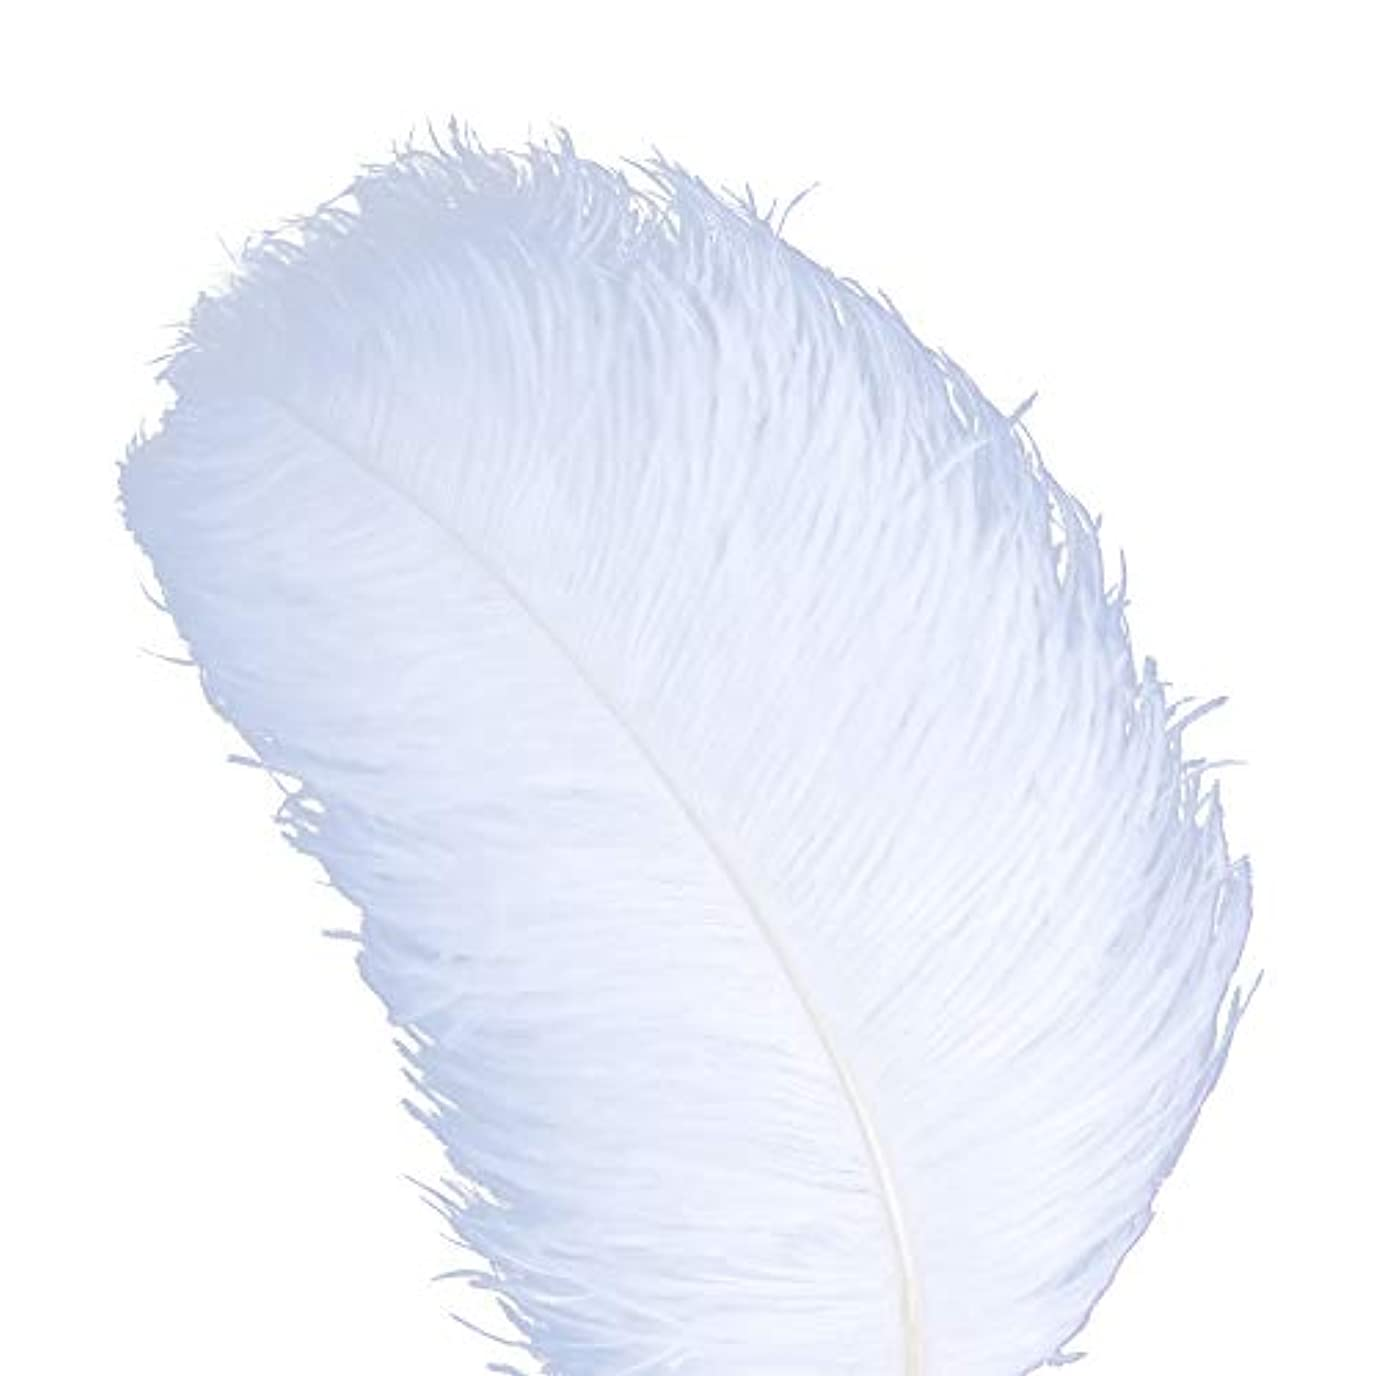 AWAYTR 天然 18-20 インチ (45-50cm) オーストリッチ 羽 プラム 結婚式 センターピース ホームデコレーション 50pcs ホワイト 743070207763